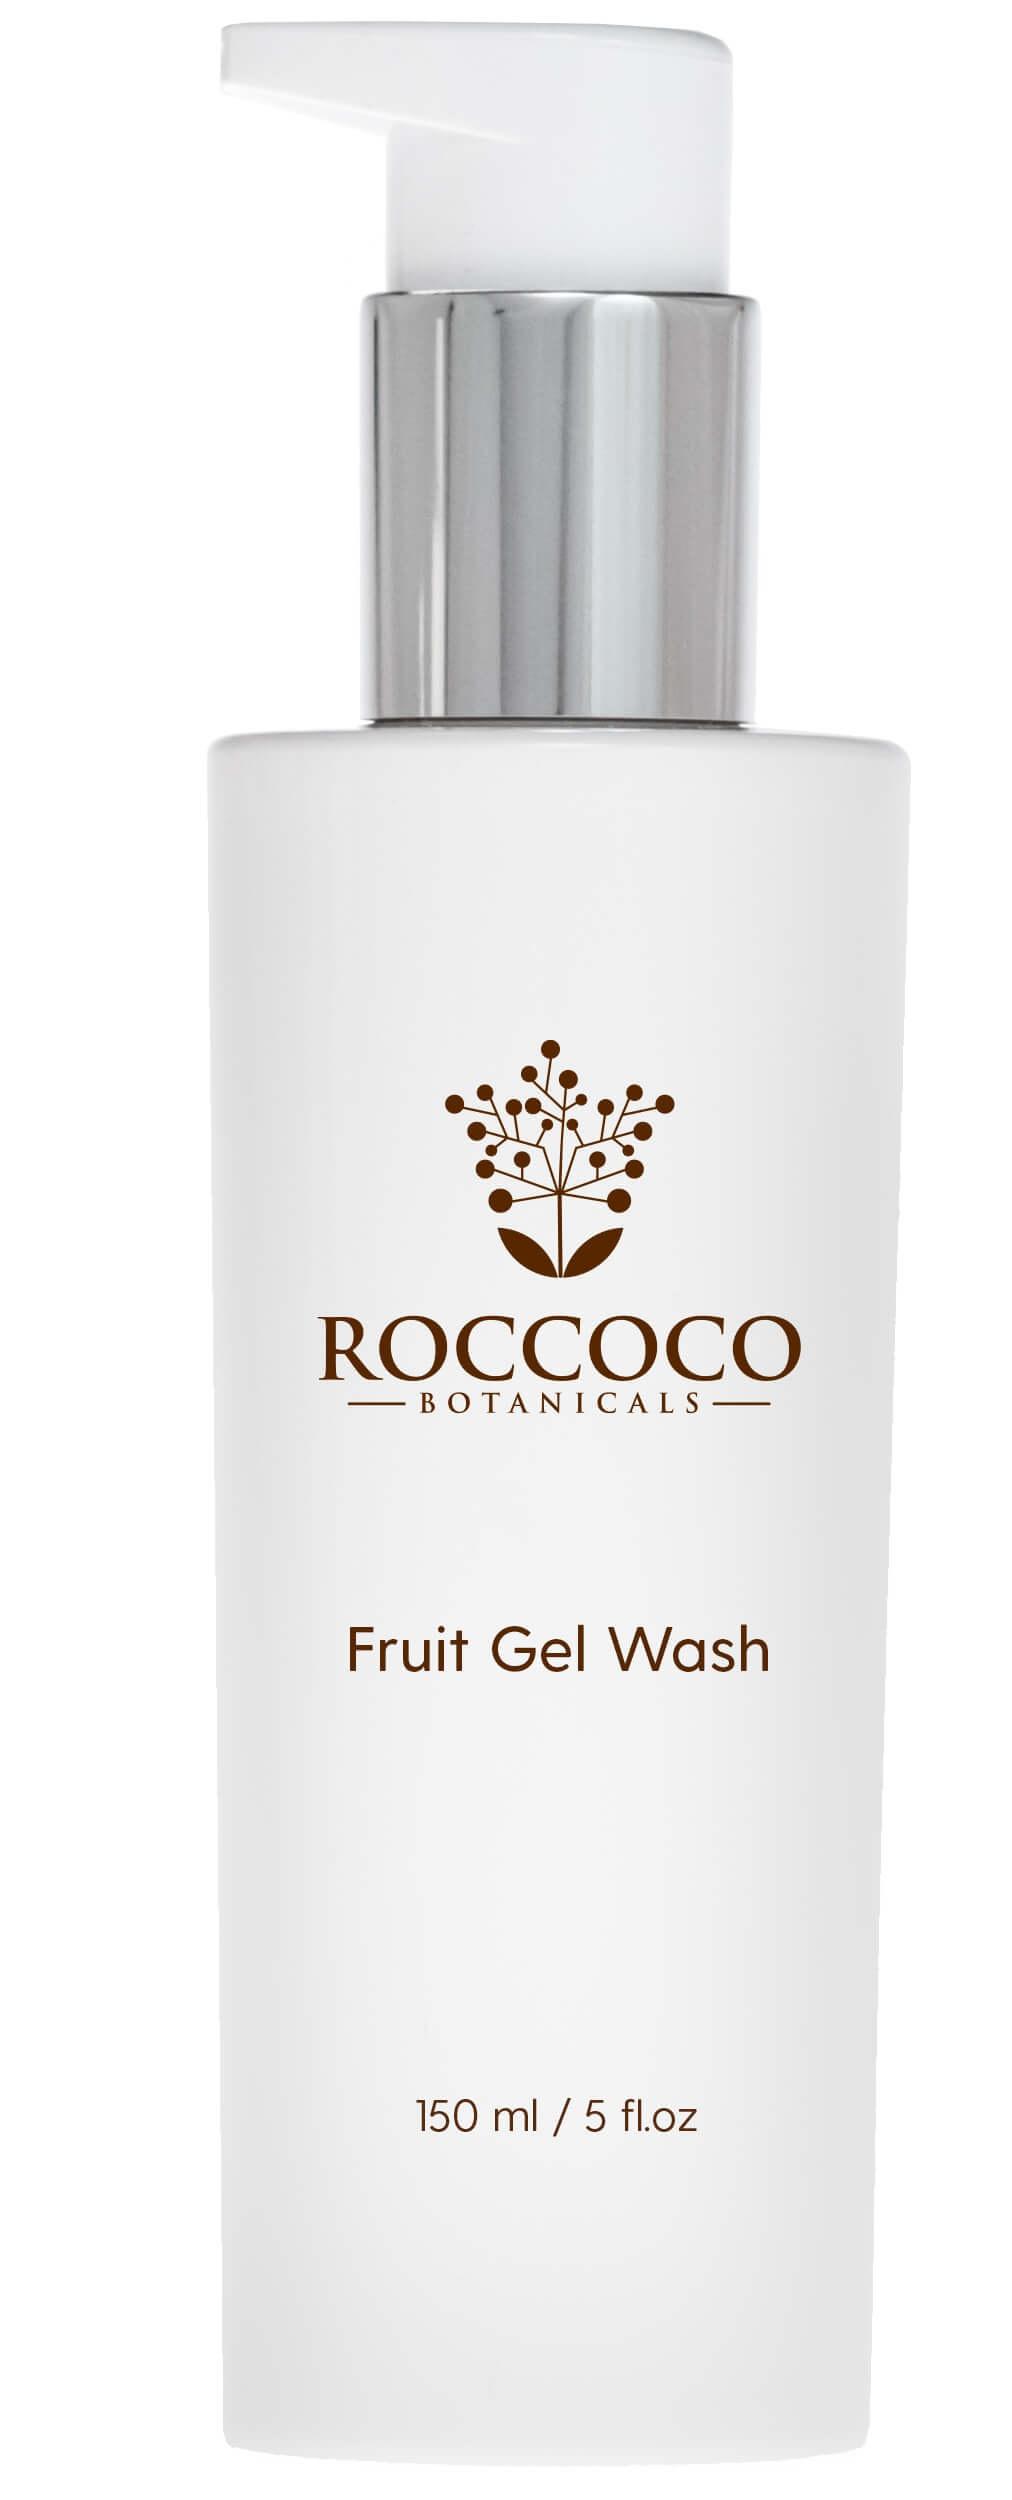 Roccoco Botanicals Fruit Gel Wash